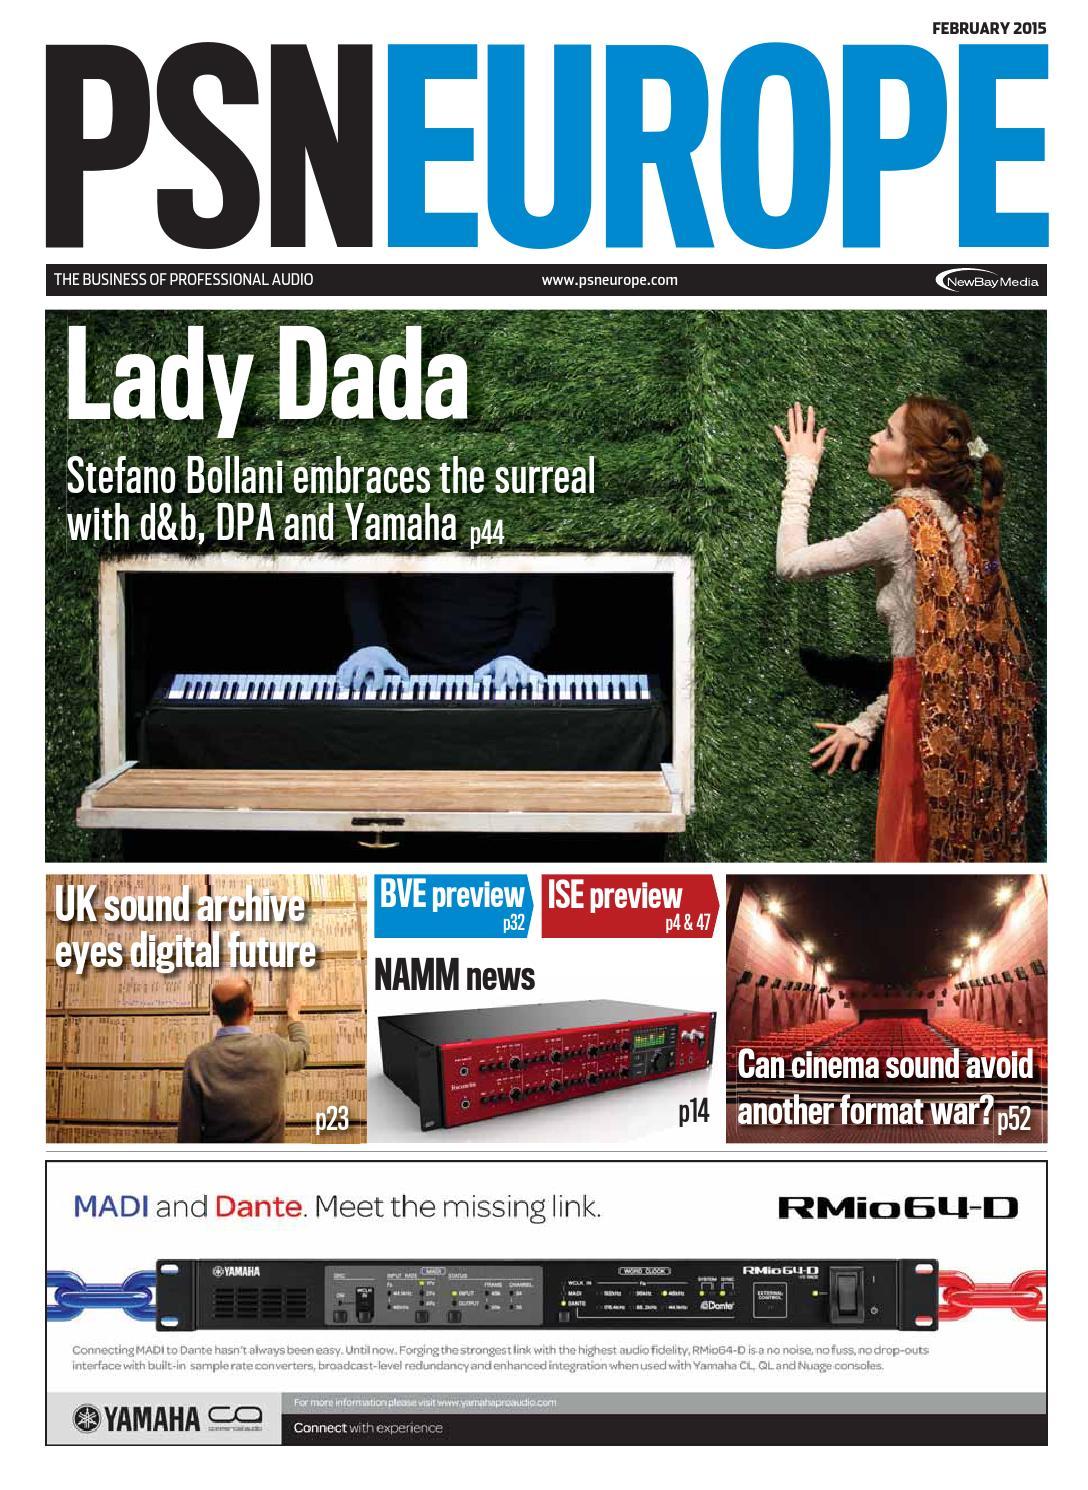 PSNE February 2015 digital edition by Future PLC - issuu